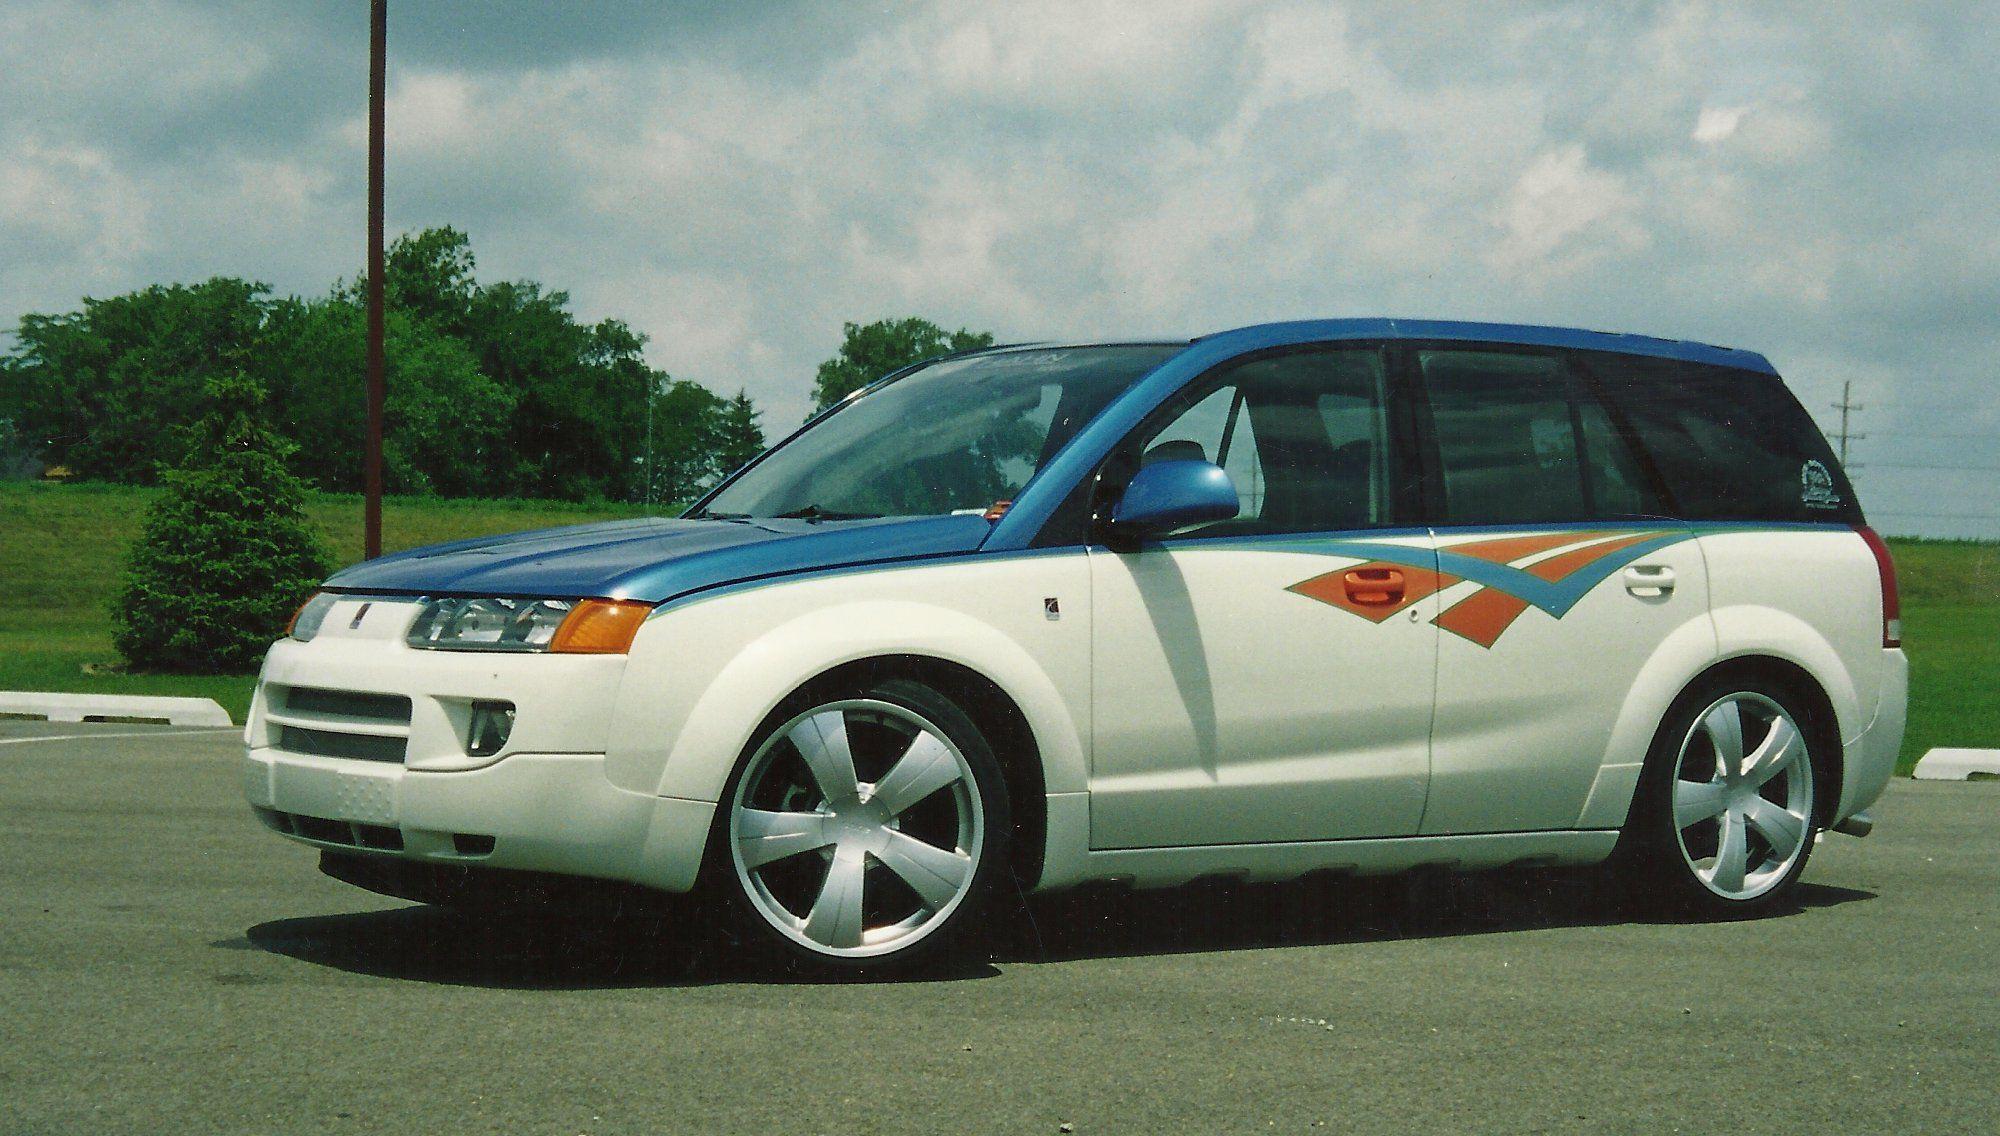 Pin By Jd Allen On Cars Retro Cars Cars Trucks Saturn